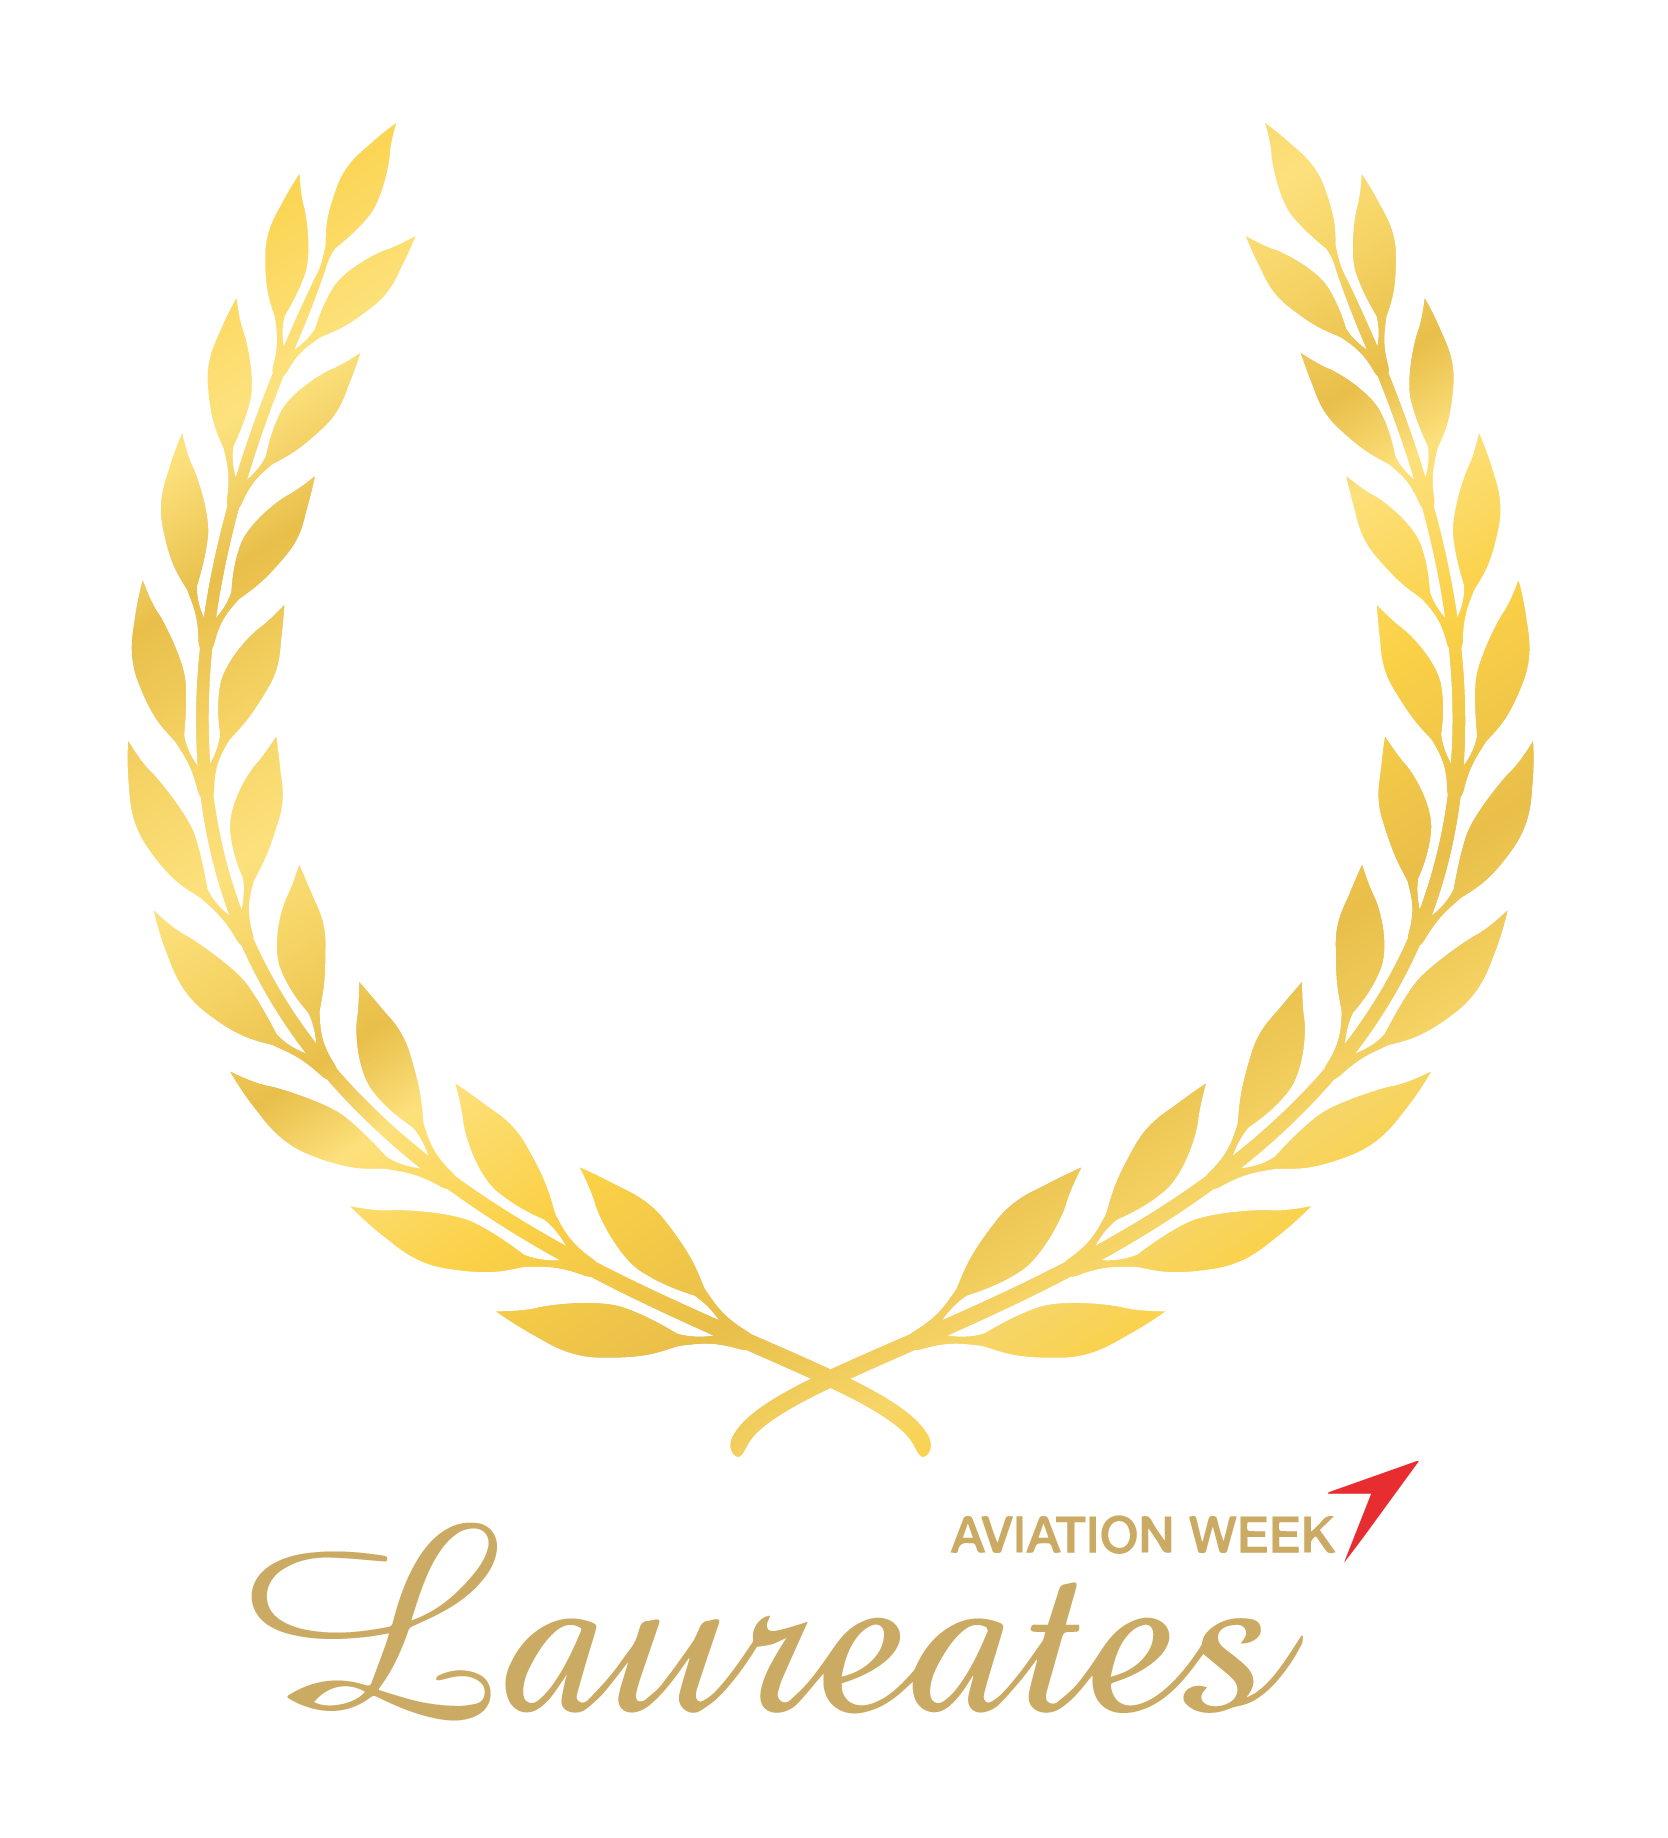 Aviation Week Laureate Award Winner